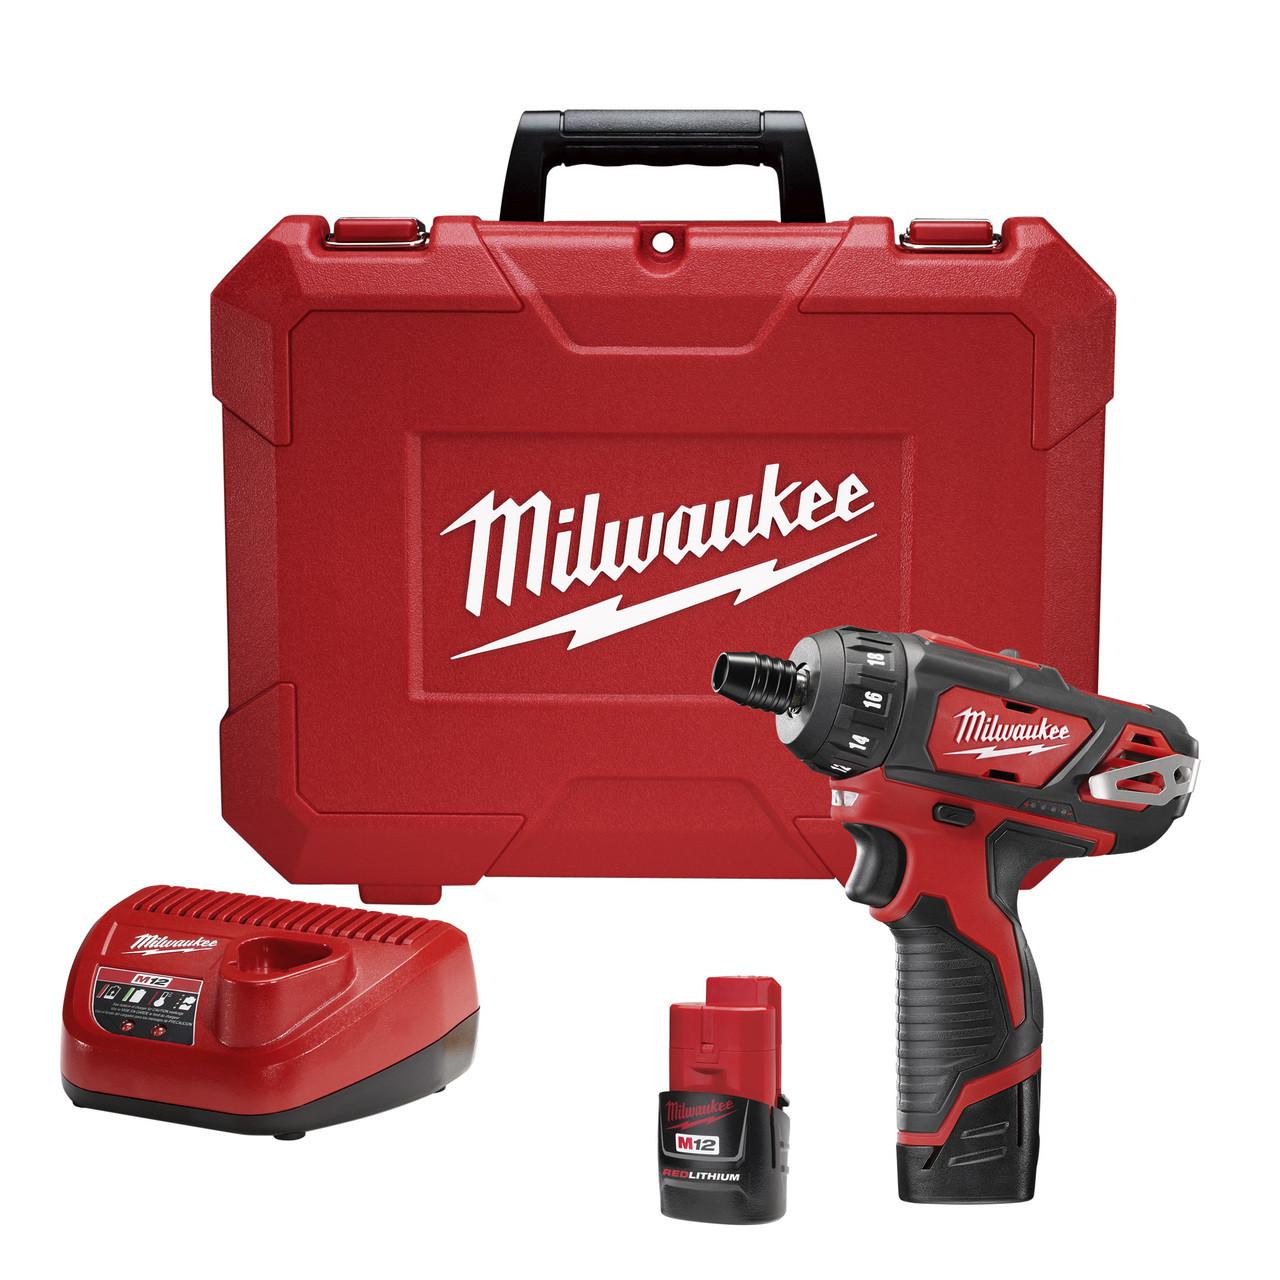 Milwaukee Cordless Combination Kits